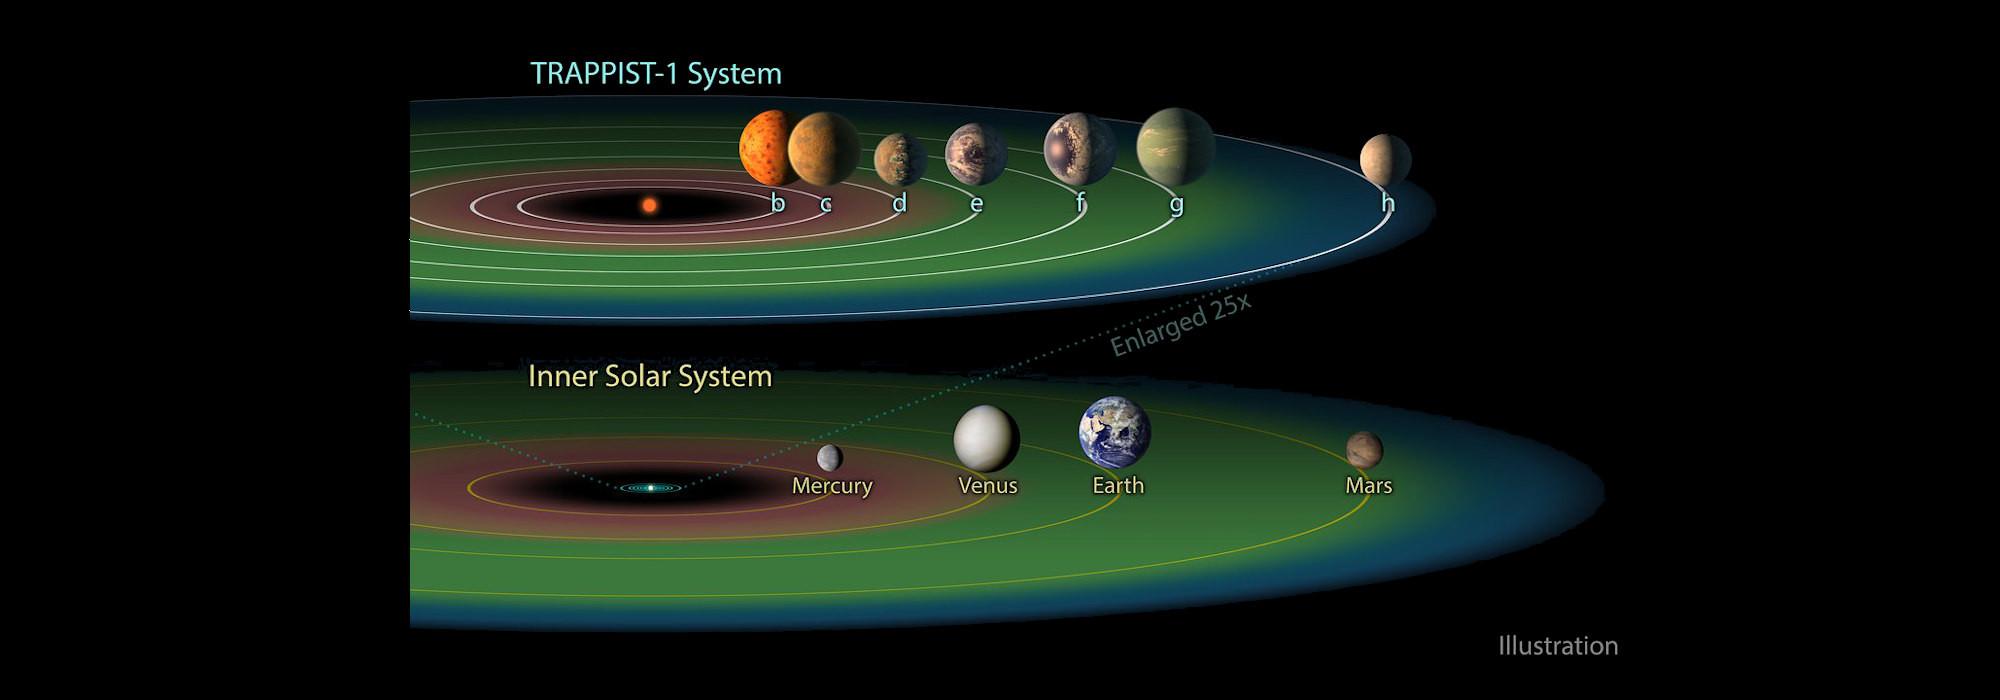 TGRTHaber | Ana Haber Manşet: Dünya gibi 7 gezegen bulundu